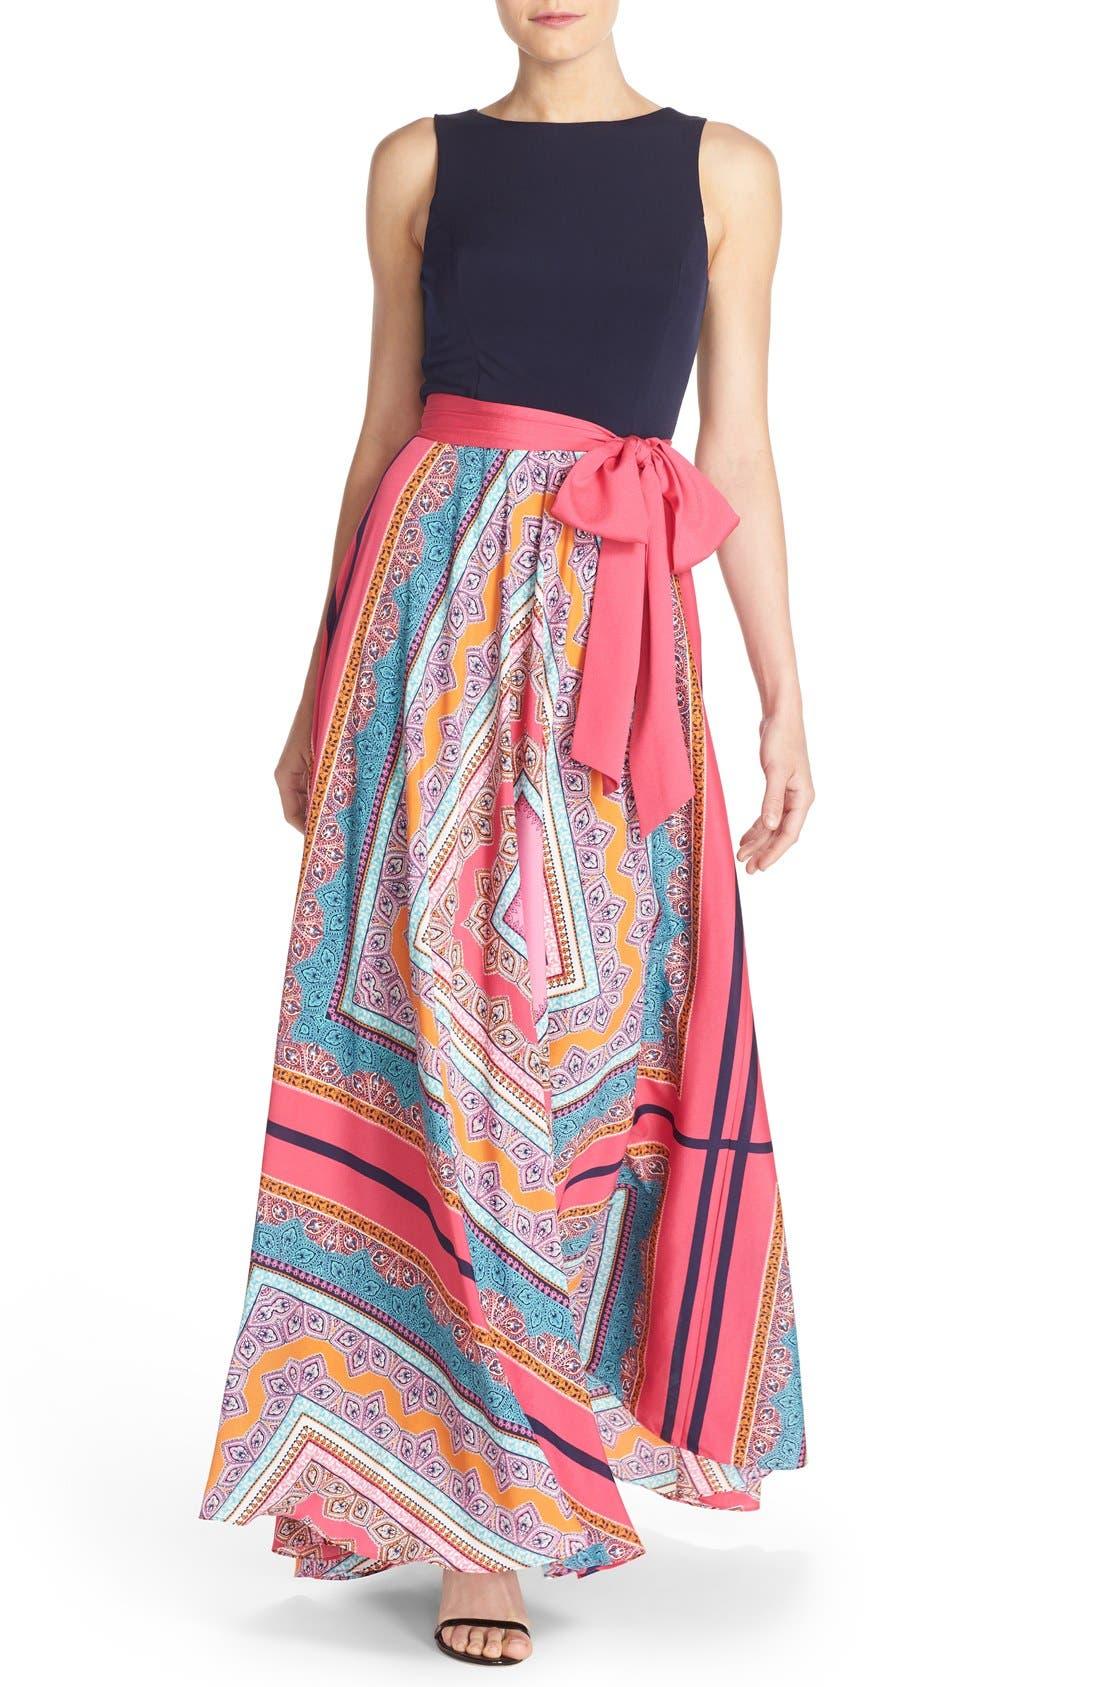 70s Prom, Formal, Evening, Party Dresses Womens Eliza J Scarf Print Jersey  Crepe De Chine Maxi Dress Size 8 - Pink $158.00 AT vintagedancer.com